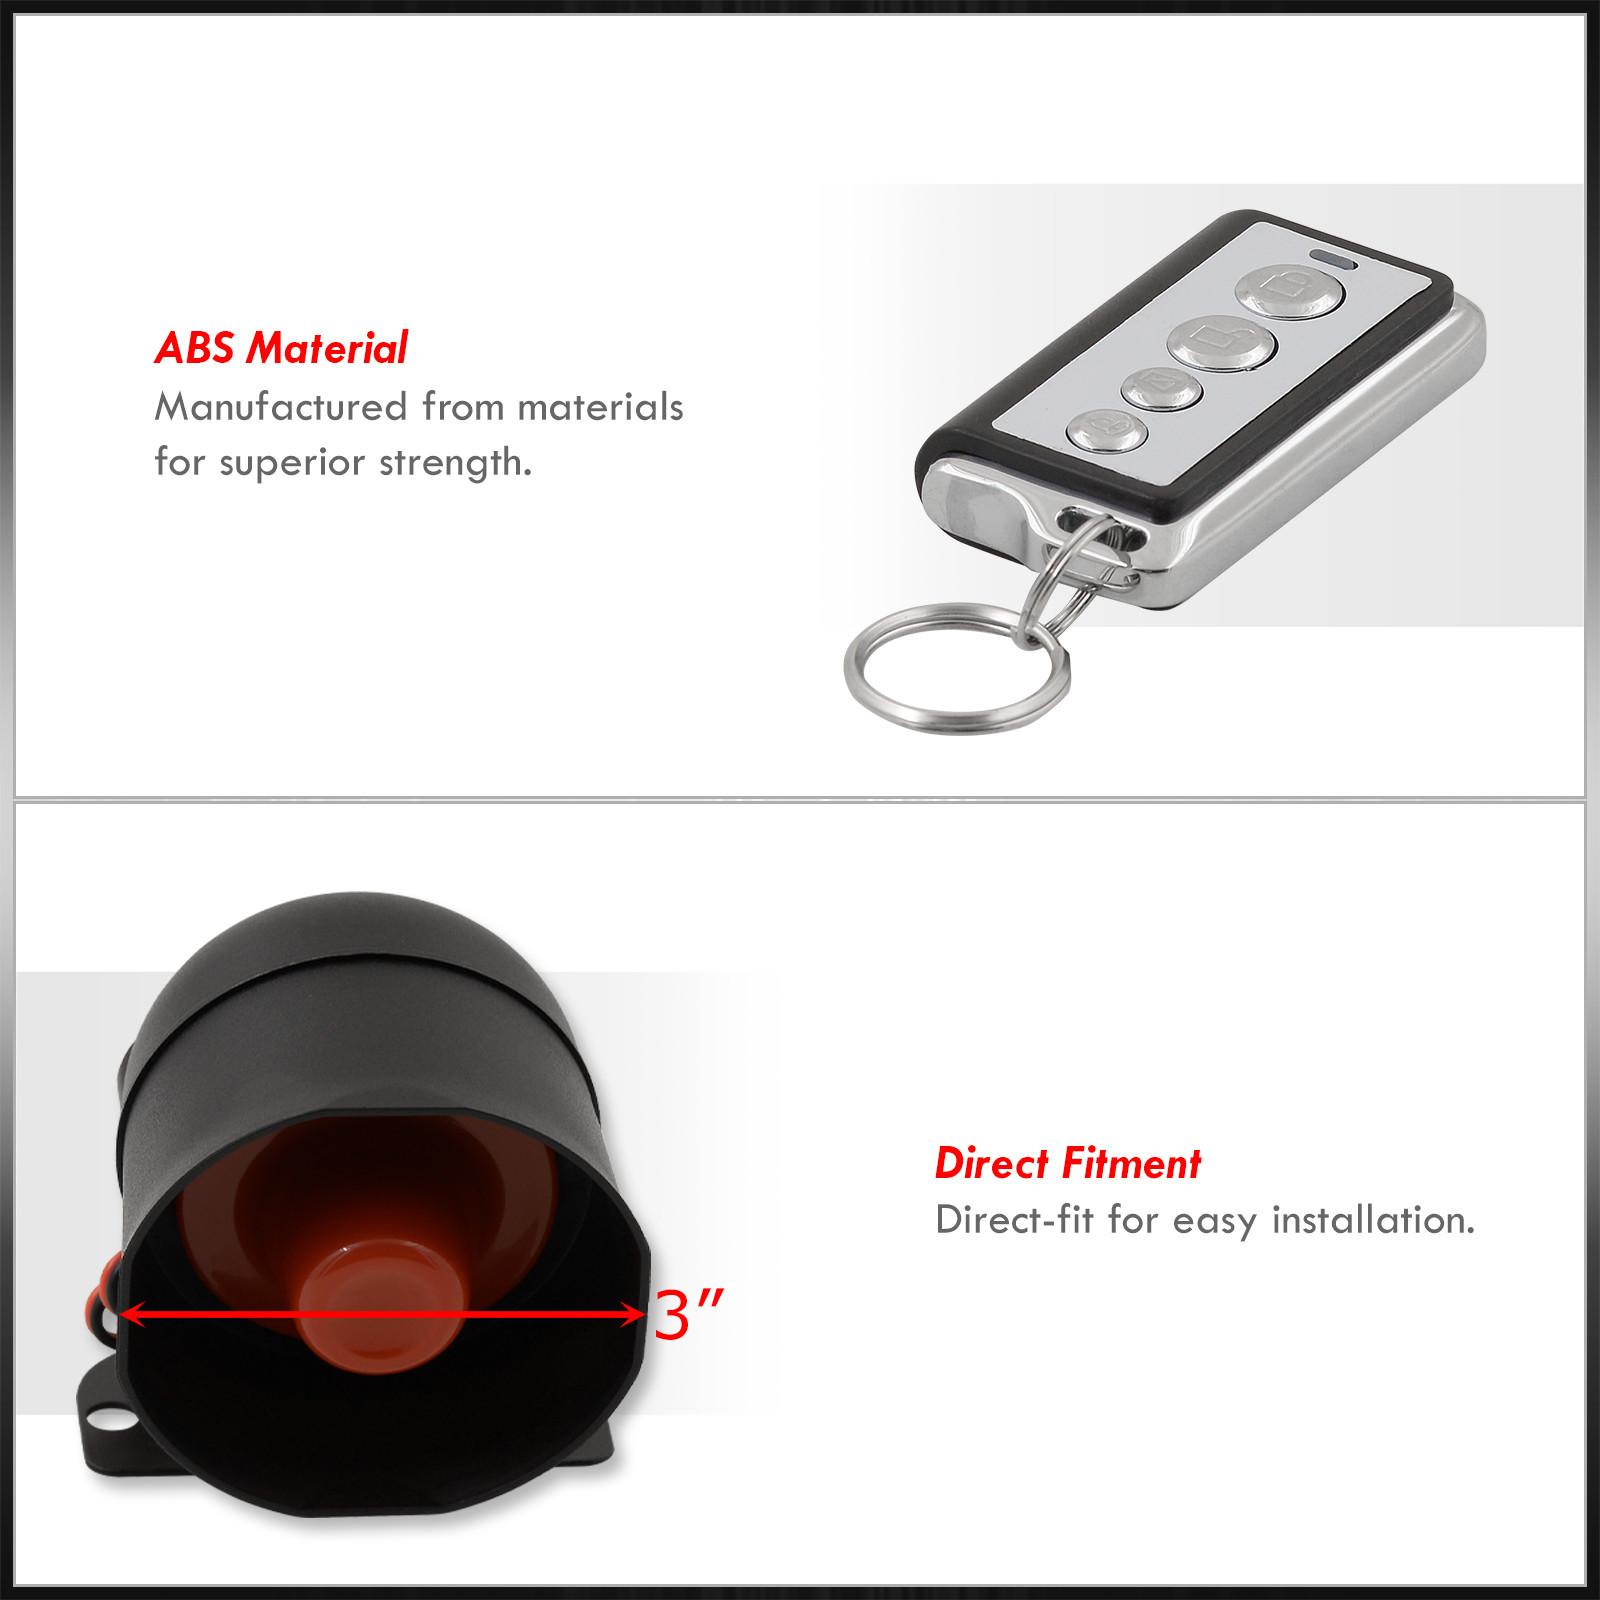 Jdm Remote Engine Start Car Alarm Security System W   Wiring Celica Mr2 Corolla